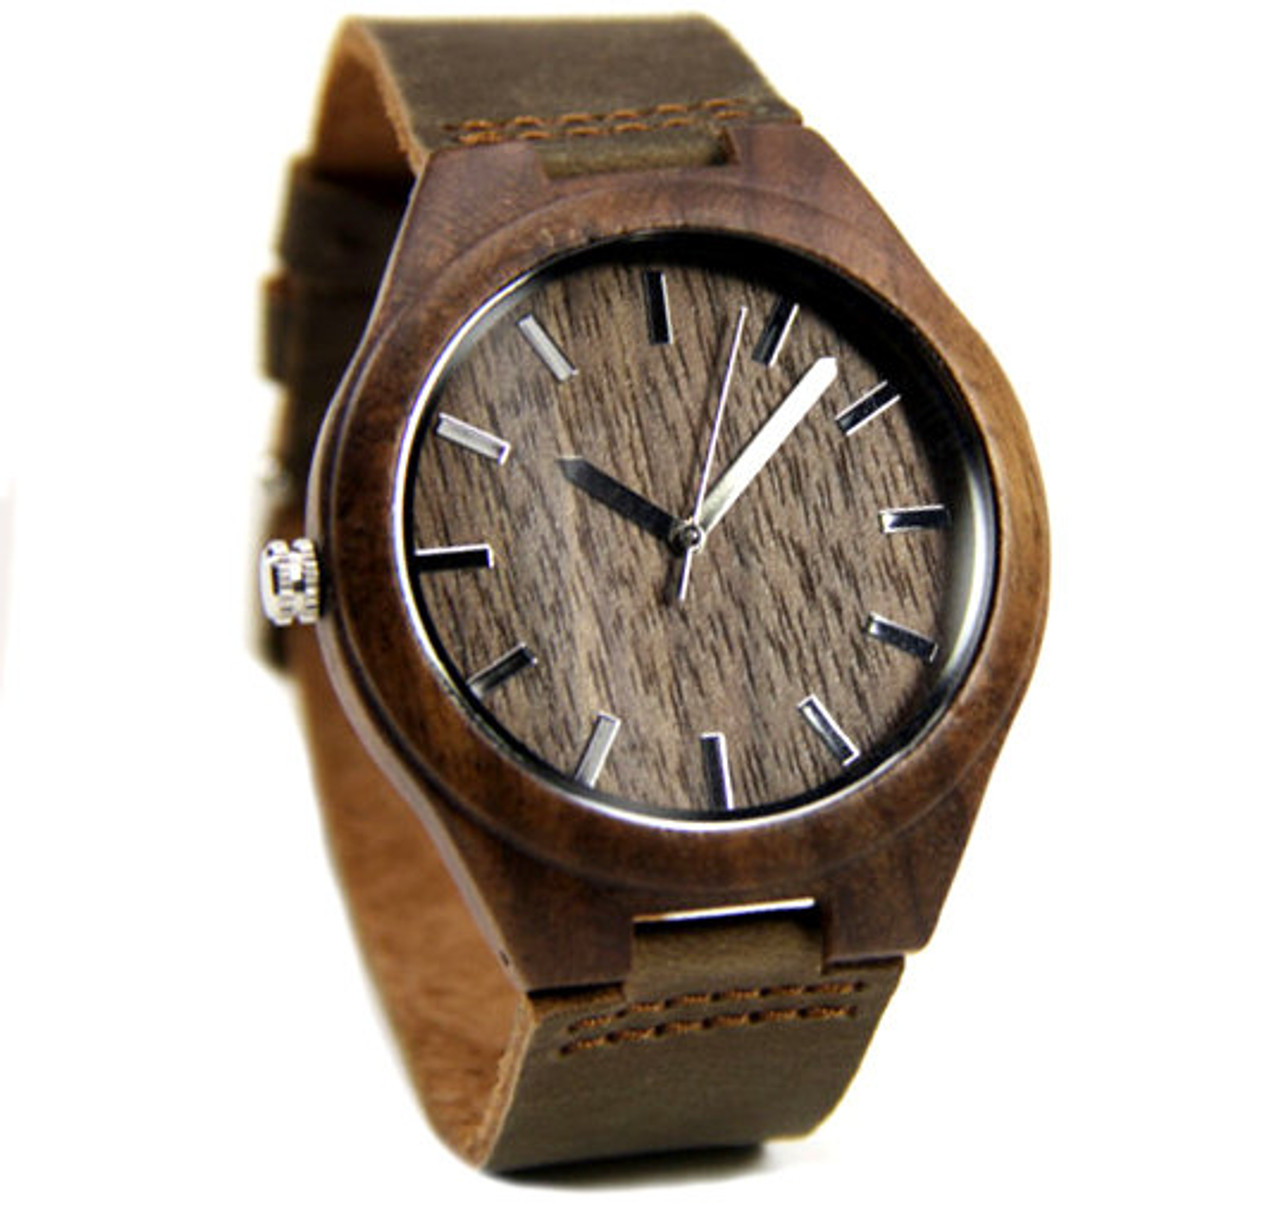 Grpn - Wood Engraved Watch W#79 - Rustic